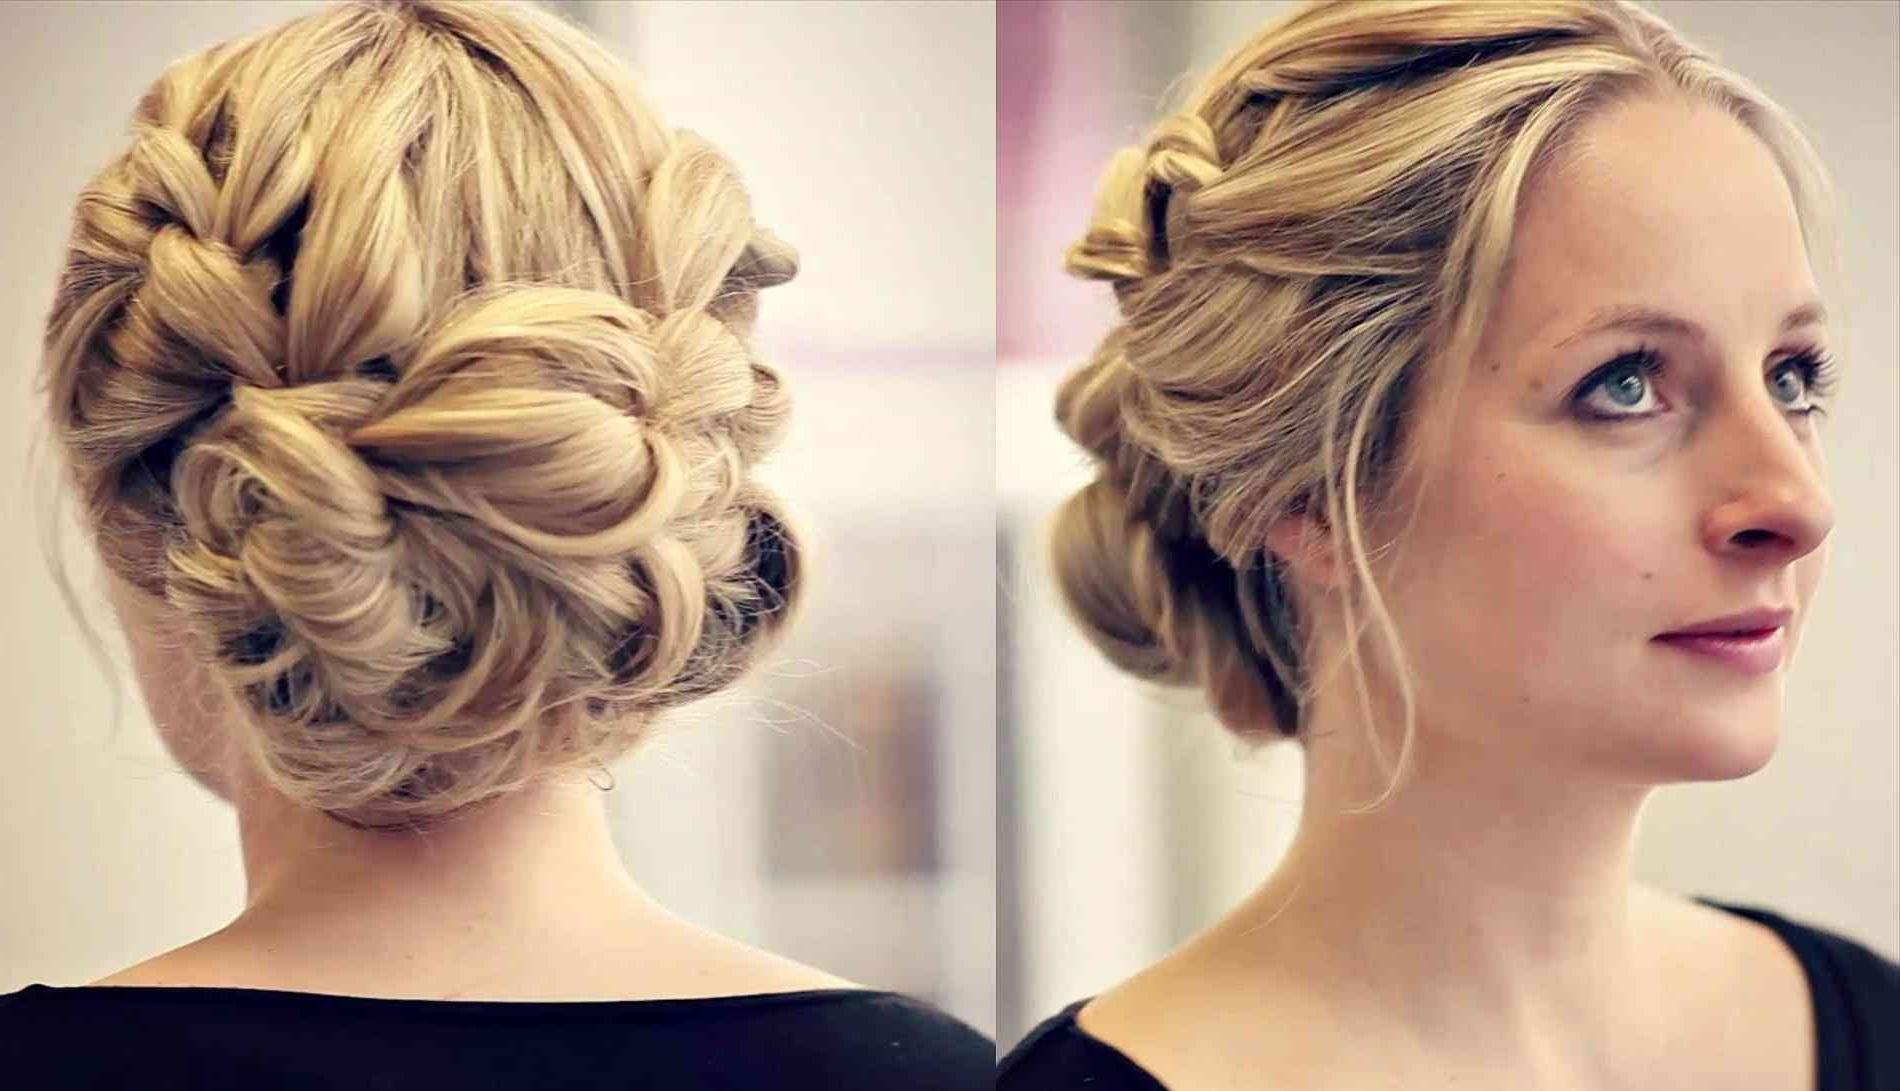 Soft Updos For Short Hair | Hair Ideas Styles With Regard To Soft Updos For Short Hair (View 13 of 15)